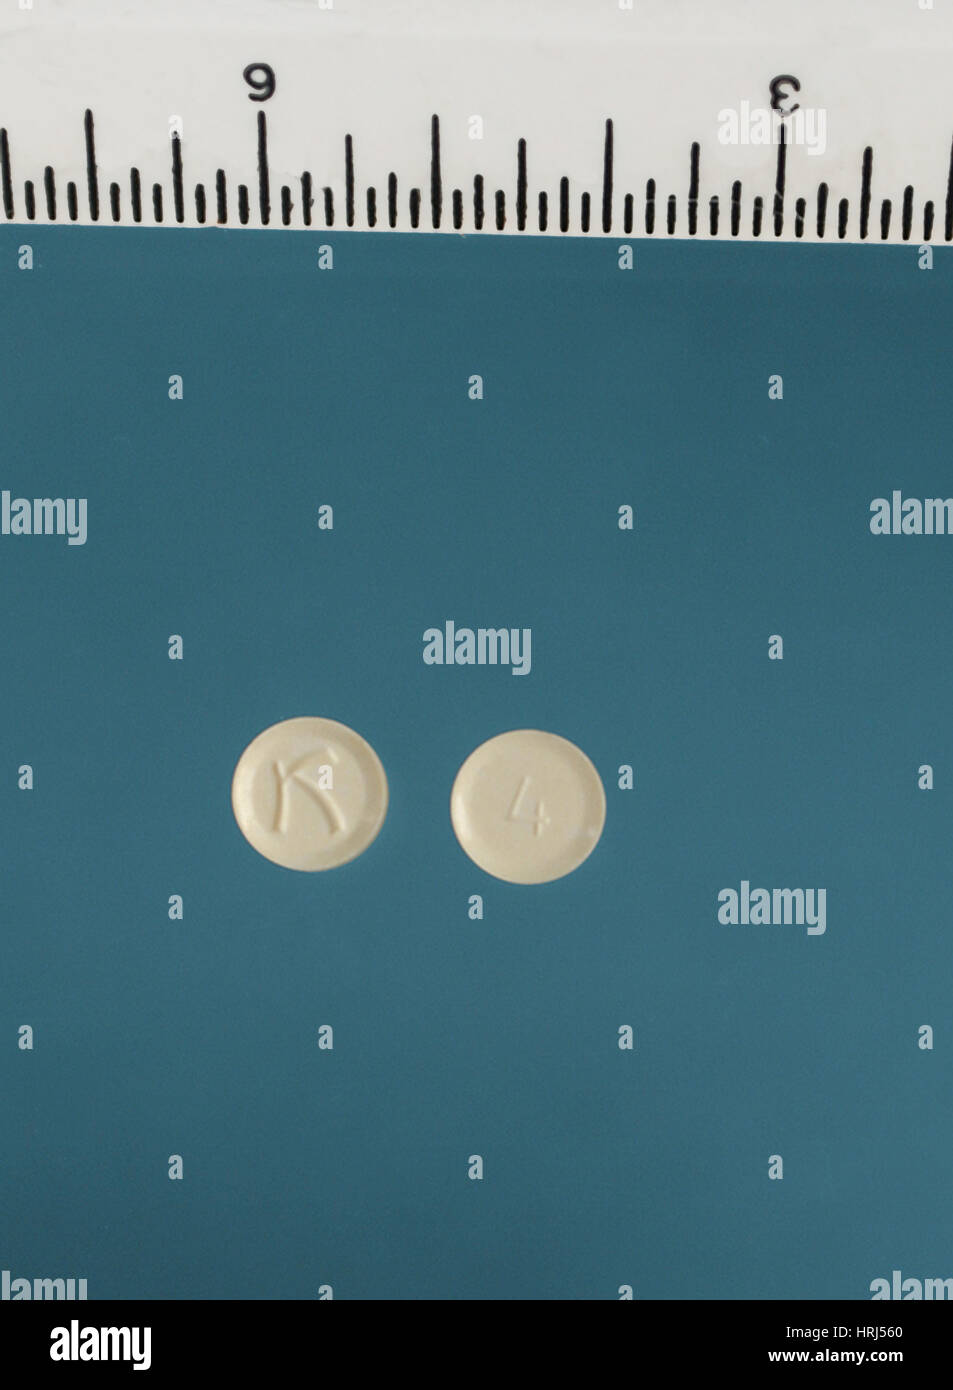 Dilaudid, Prescription Medicine for Pain Relief - Stock Image